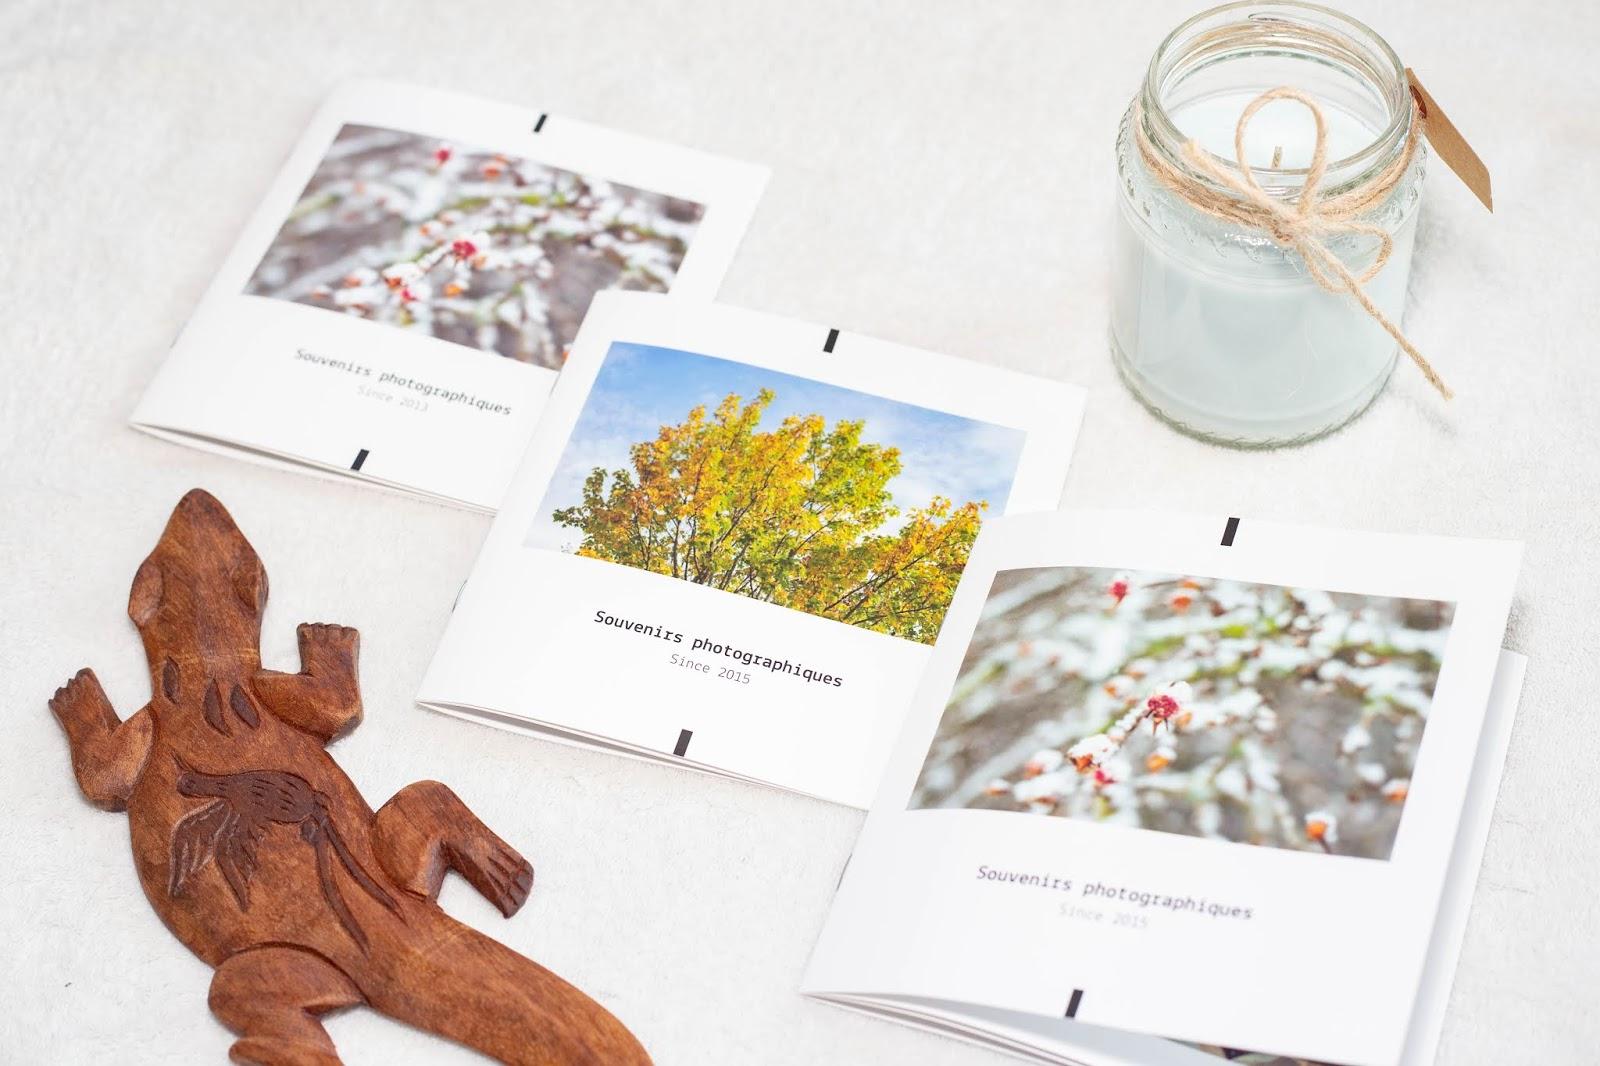 https://www.notebook.ldmailys.com/2019/03/tipii-impressions-photos-mini-livrets.html